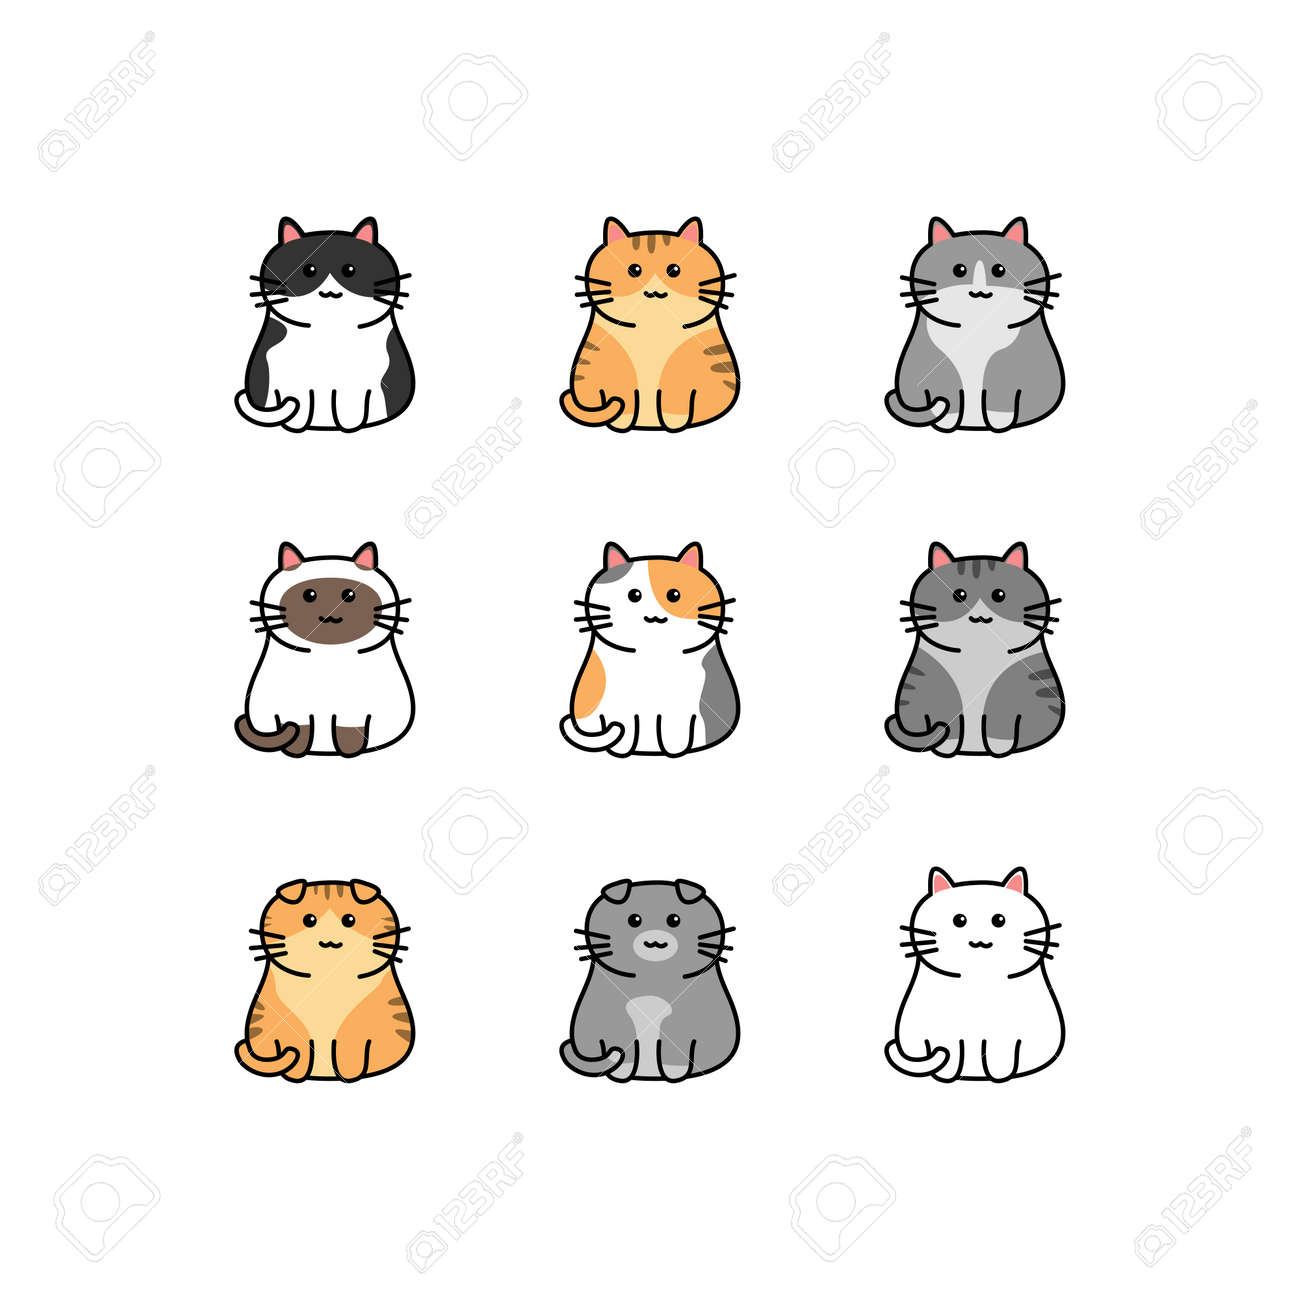 Cute cat cartoon collection, vector illustration - 169151630